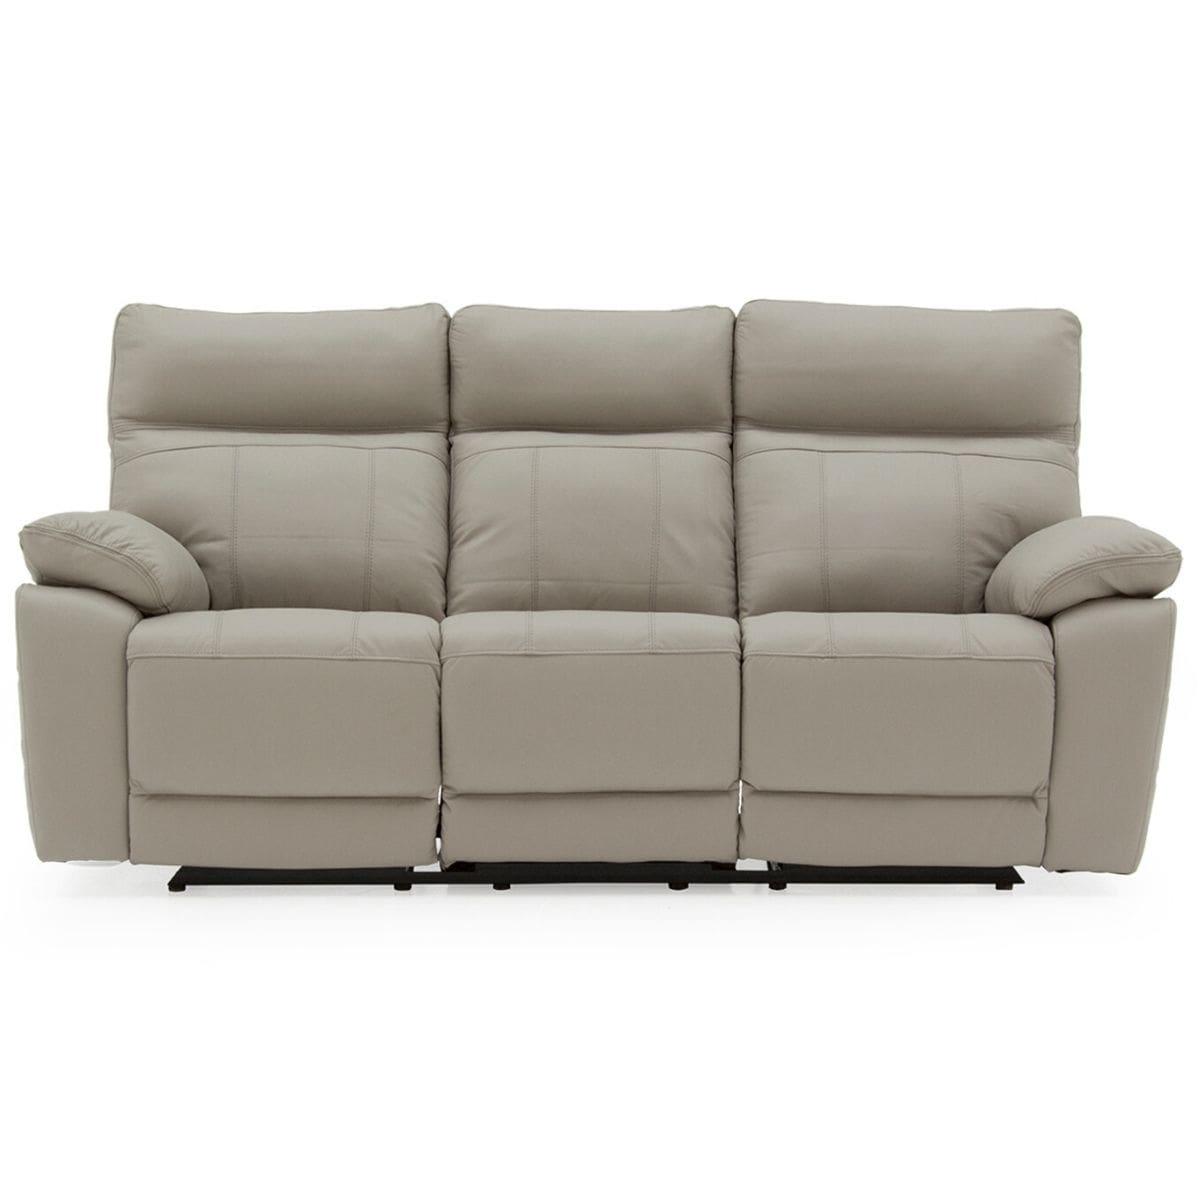 Pomona 3 Seater Recliner Sofa